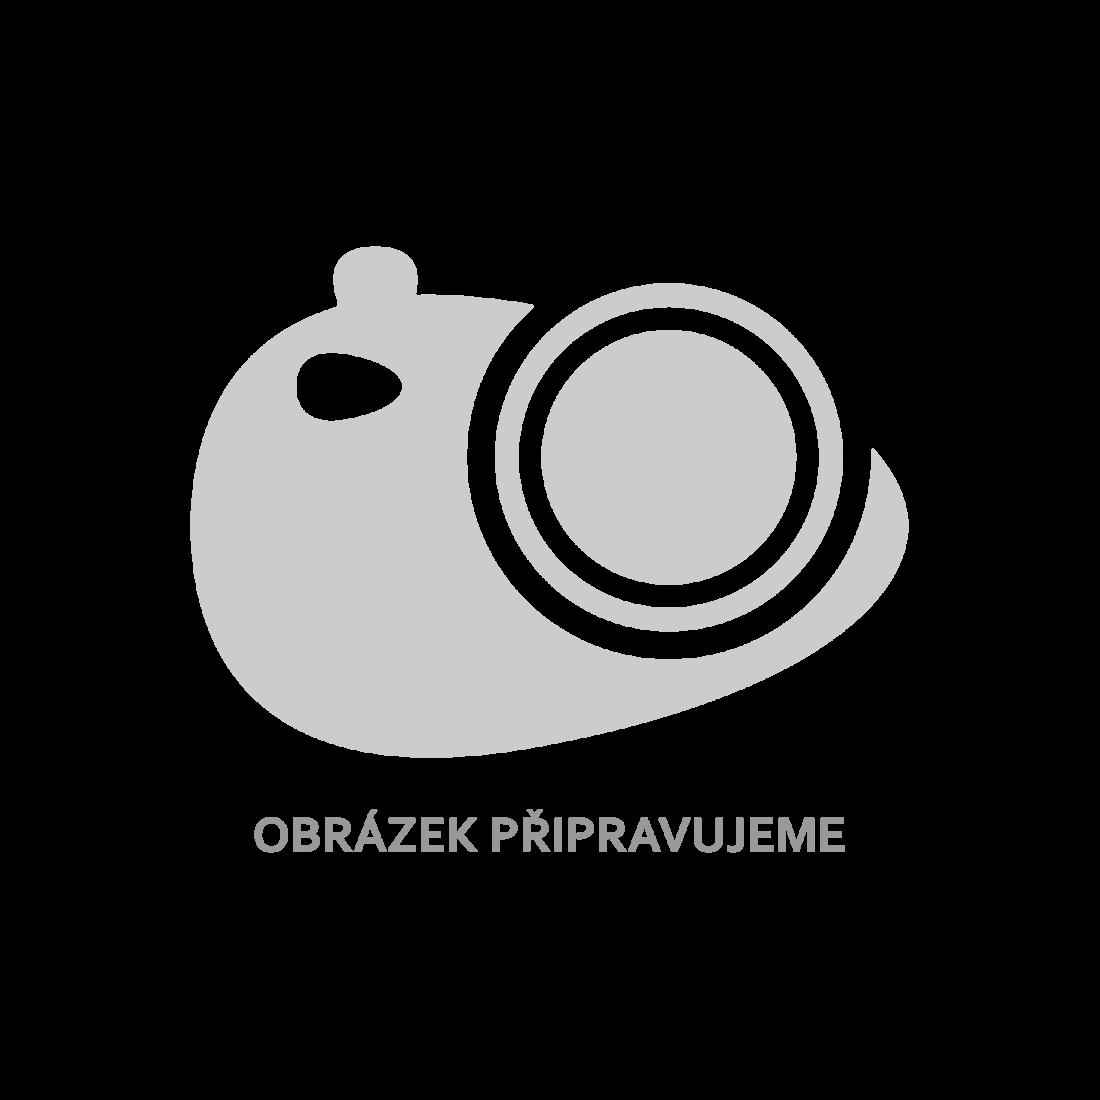 vidaXL Knihovna šedá 80 x 24 x 75 cm dřevotříska [800893]